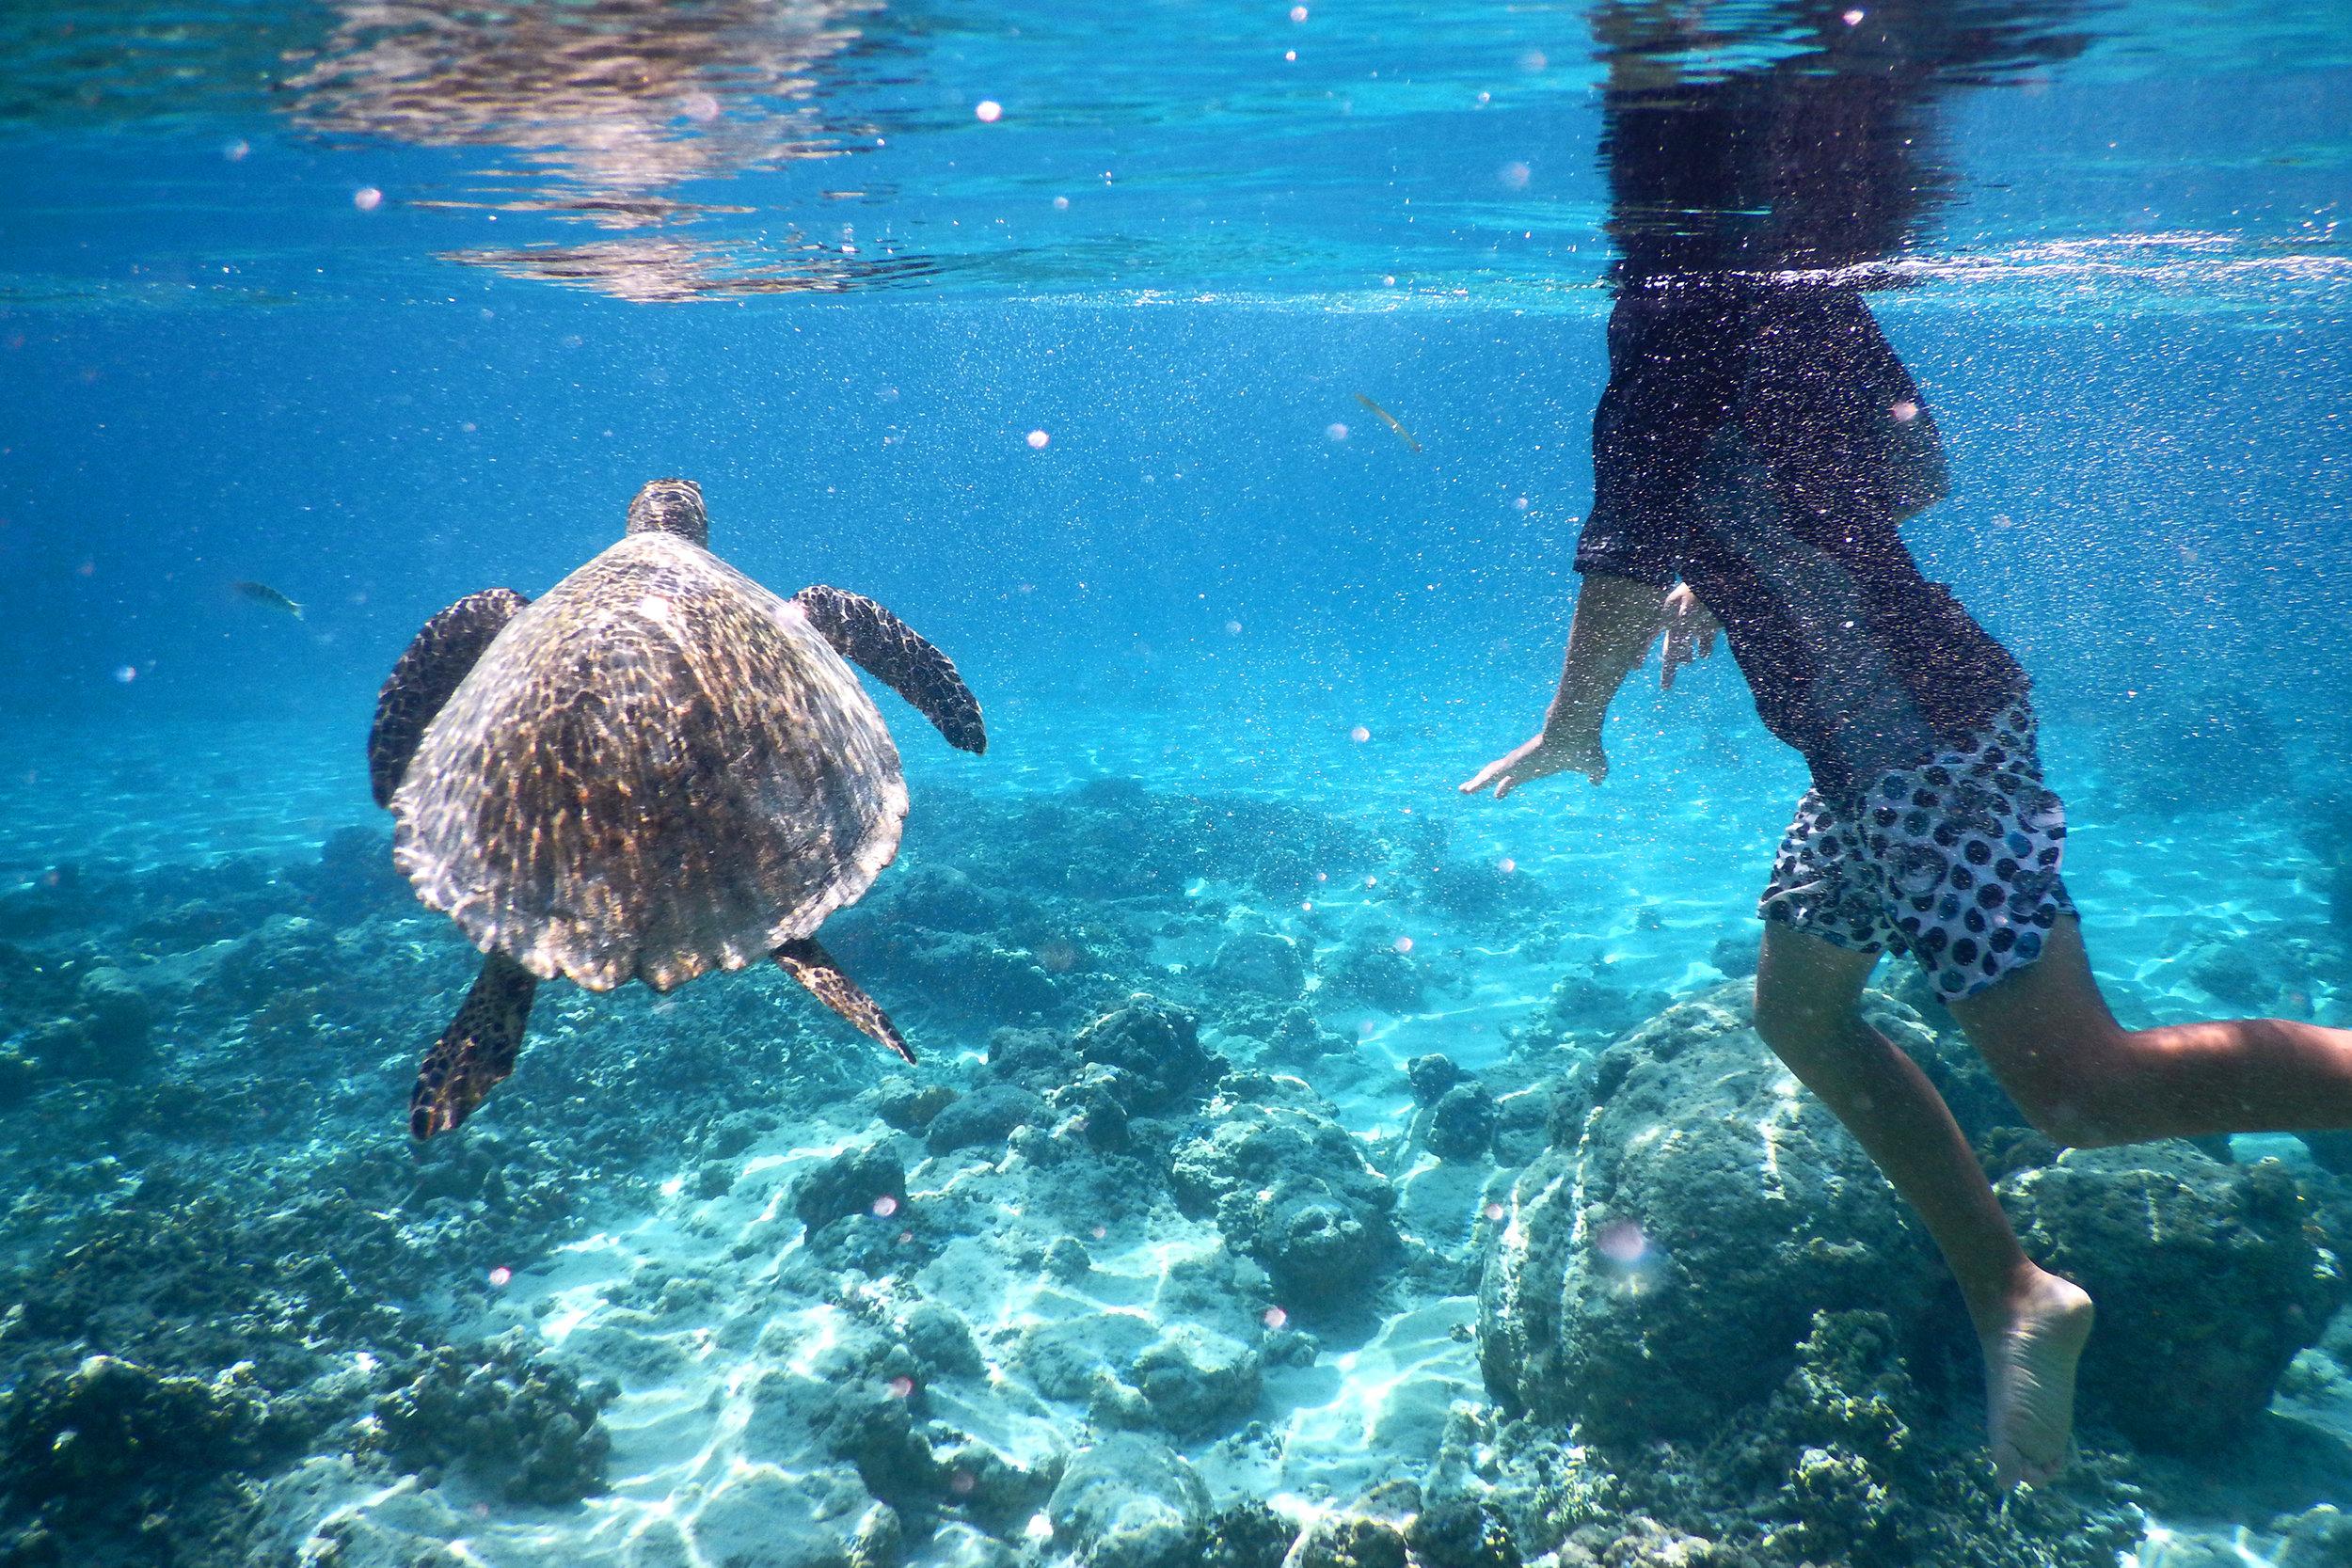 Gili T, Trawagan, snorklailu, Indonesia